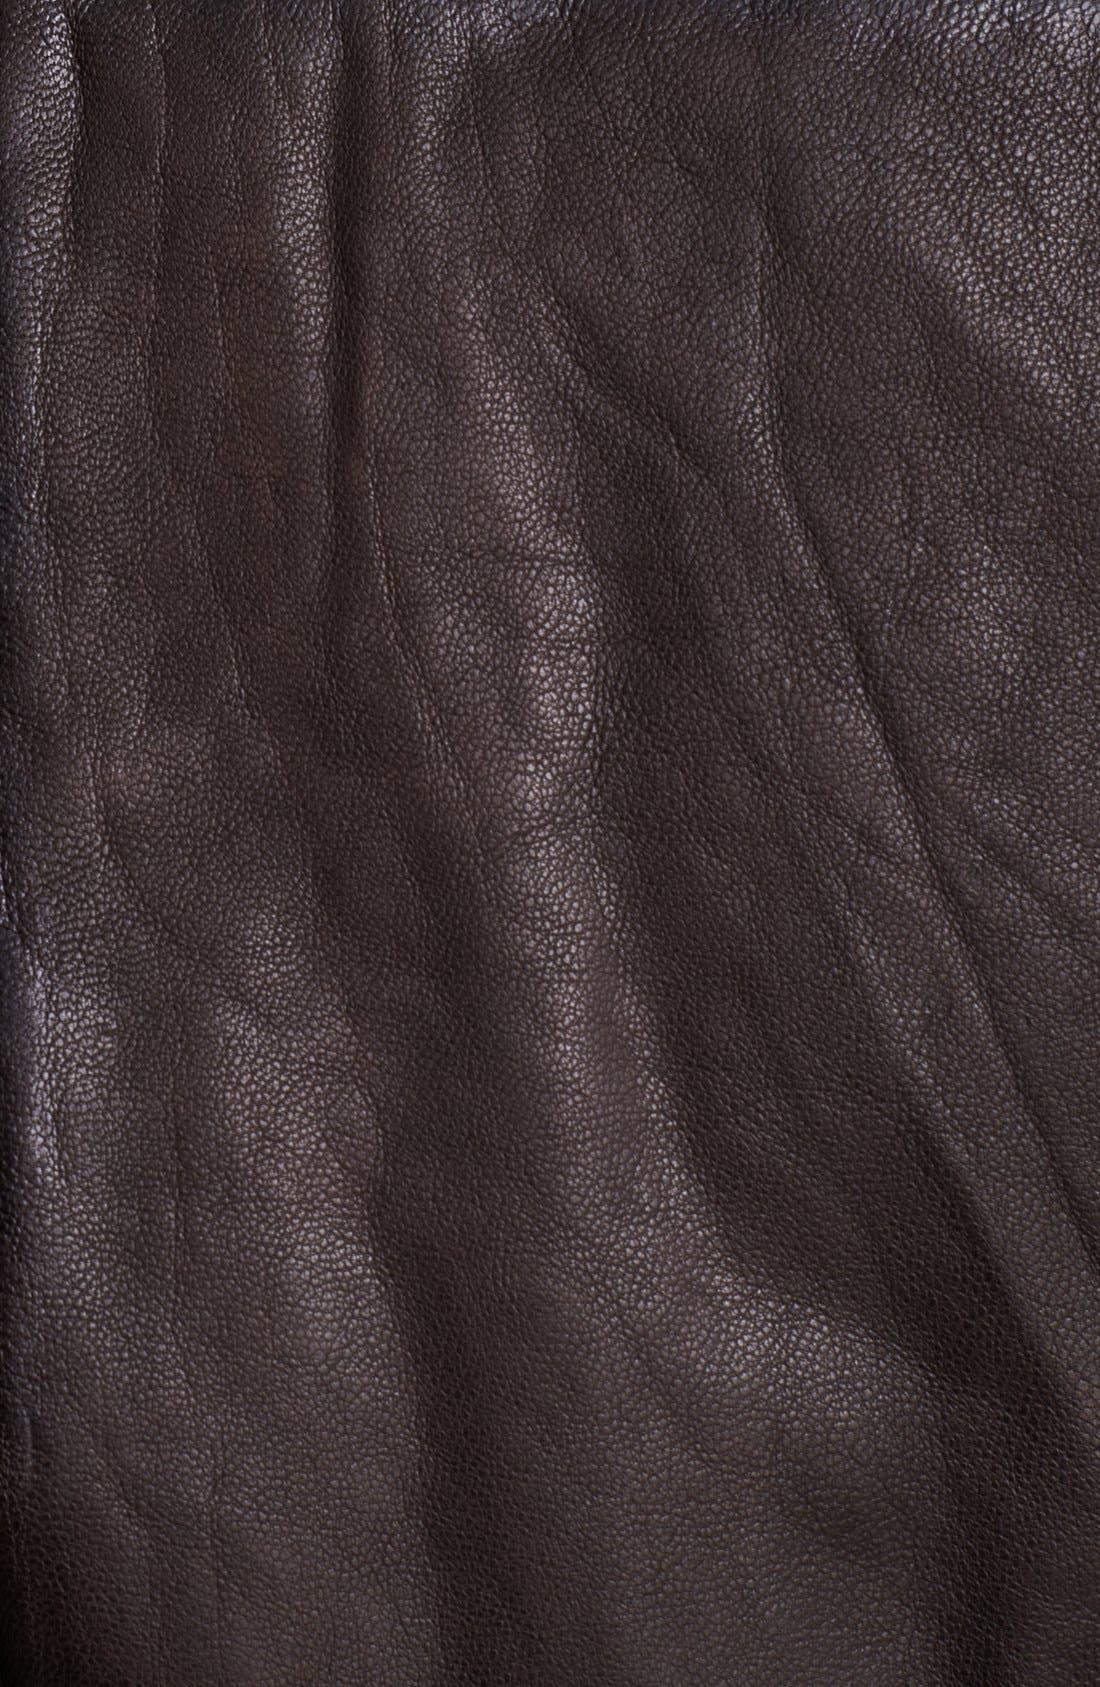 JACK SPADE, 'Huxley' Leather Bomber Jacket, Alternate thumbnail 2, color, 200